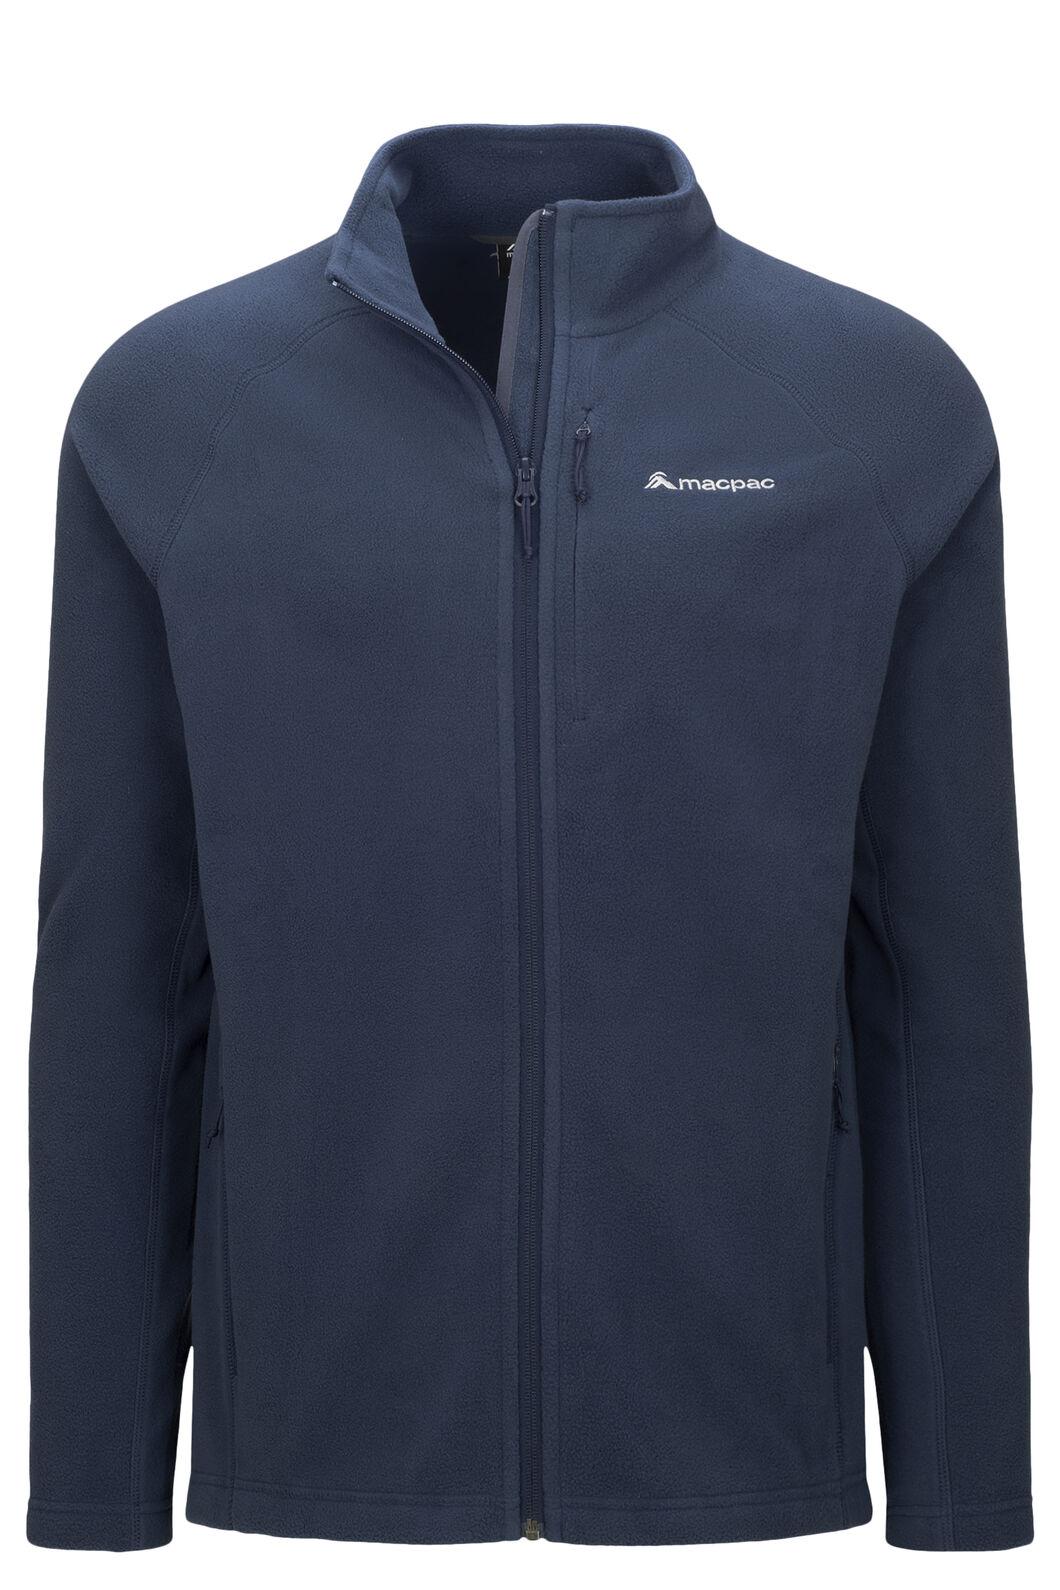 Macpac Men's Tui Polartec® Micro Fleece® Jacket, Black Iris, hi-res